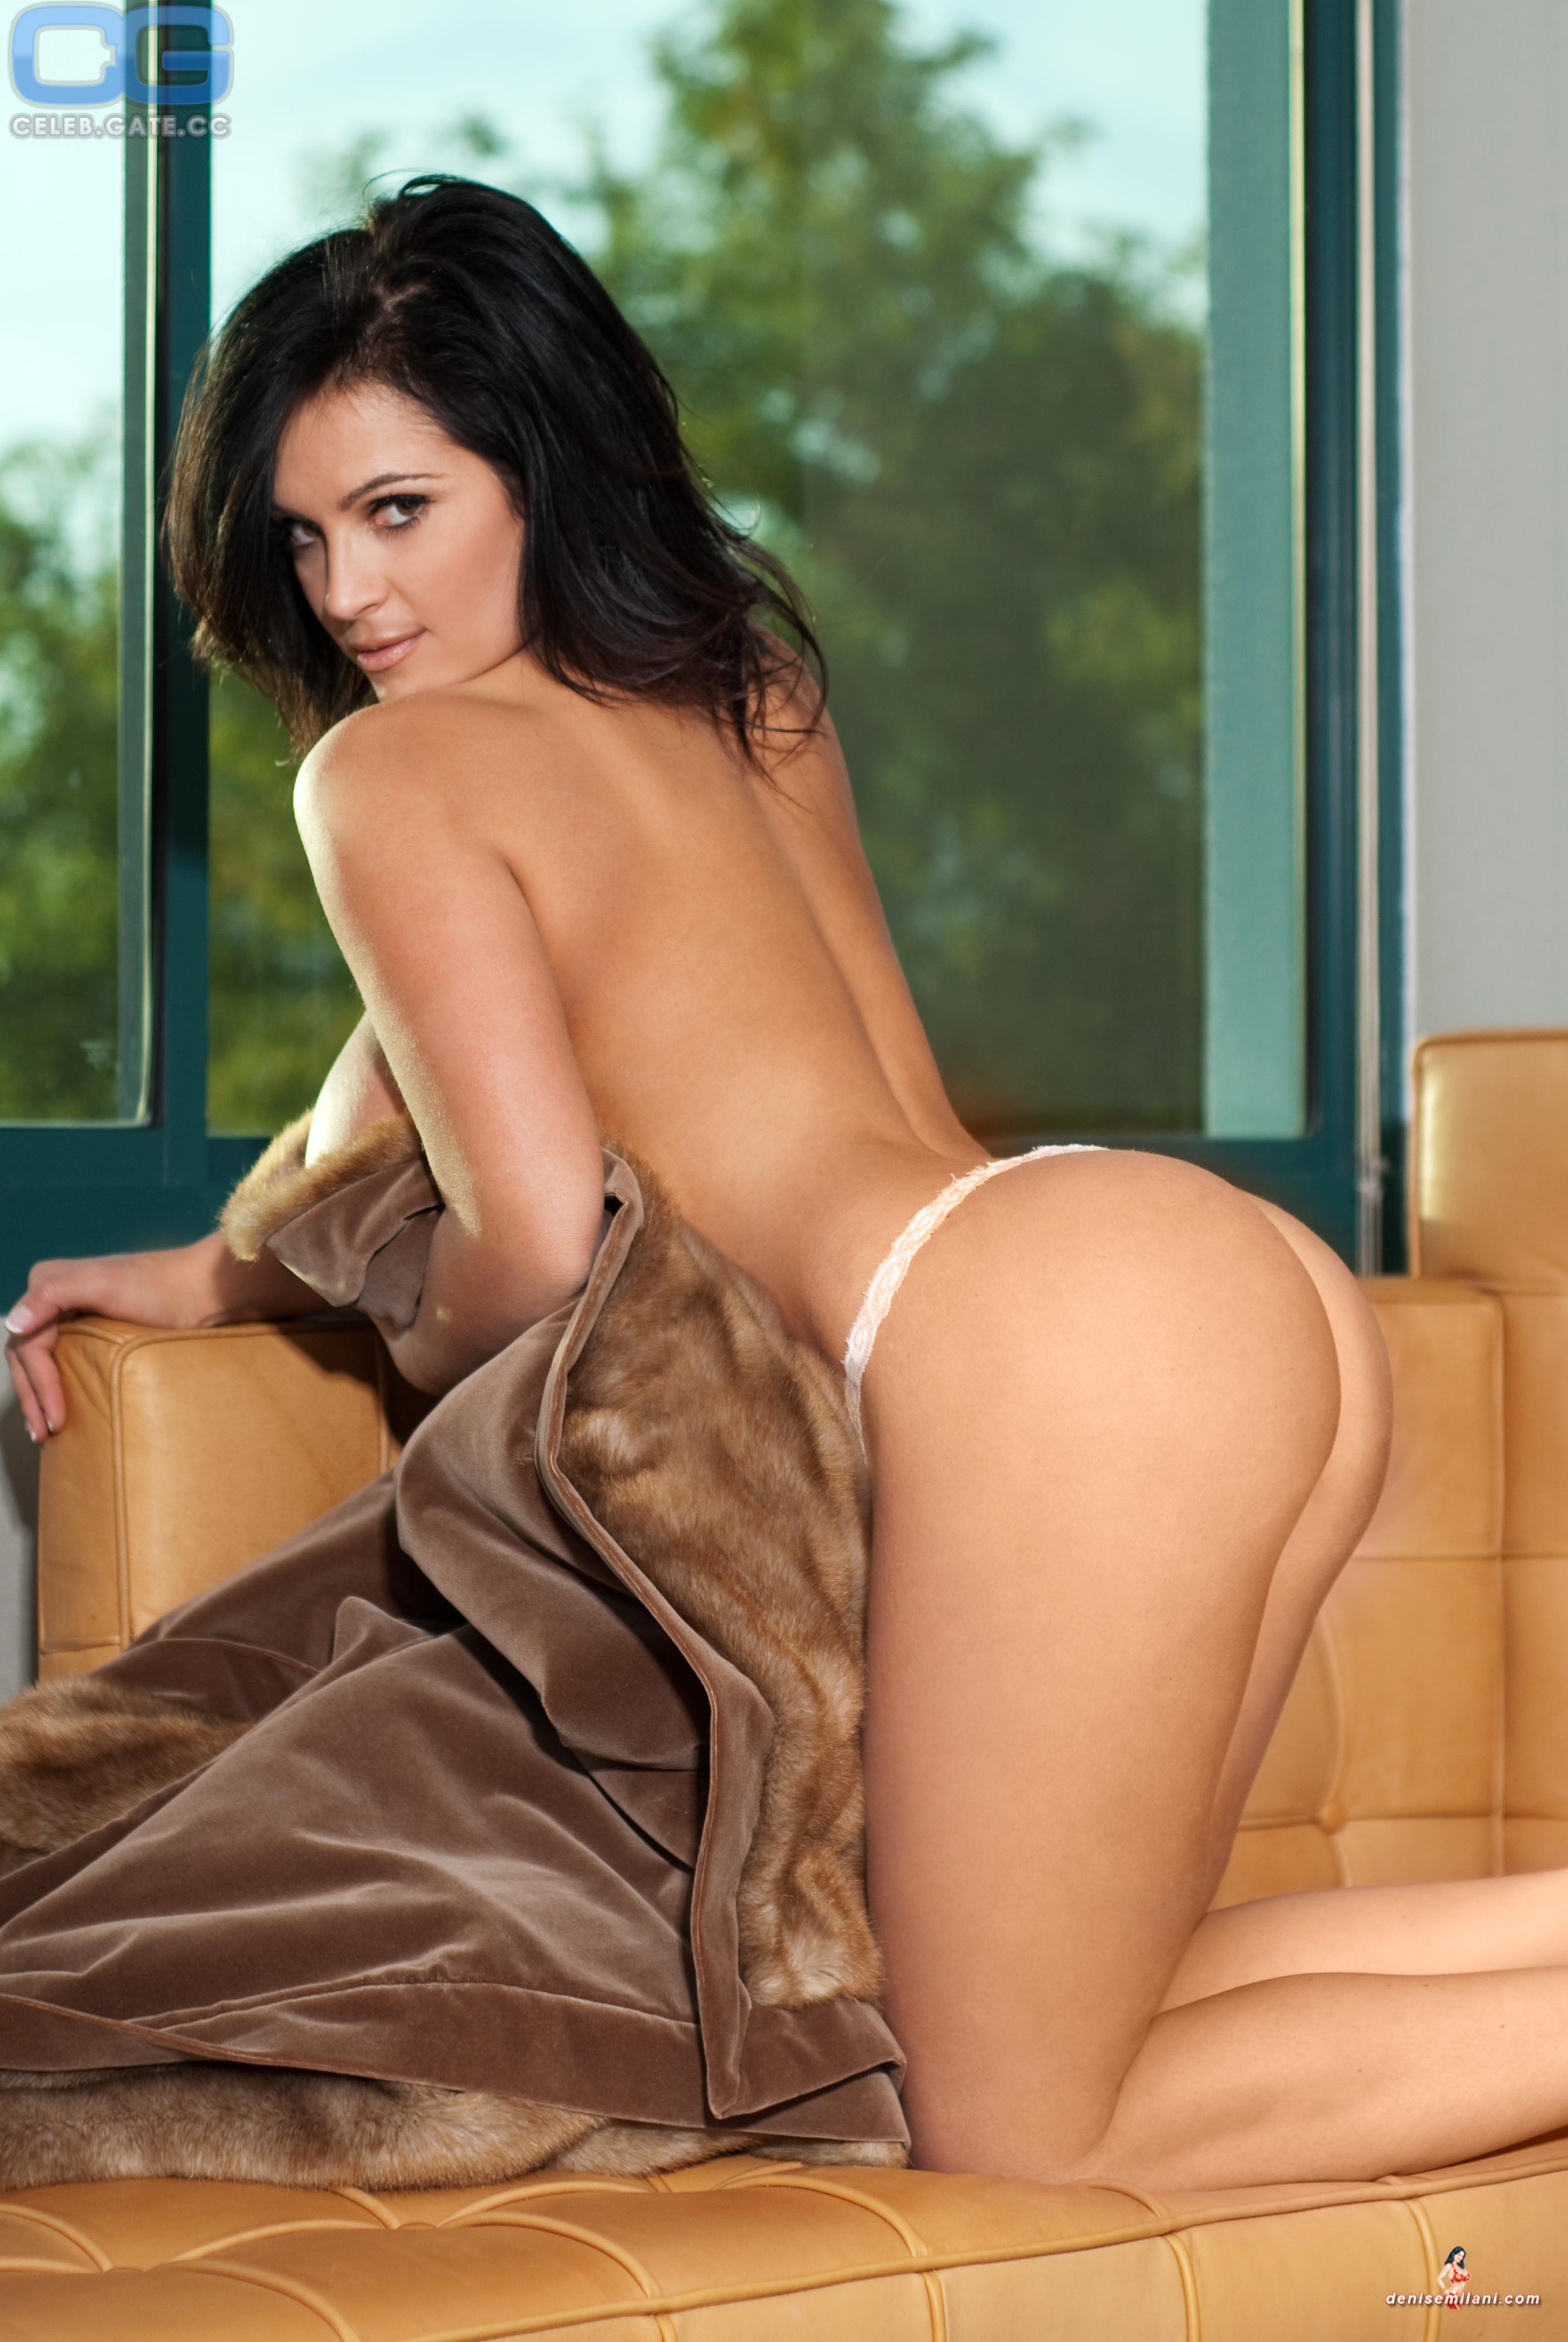 Bikini Naked Photos Of Denise Milani Png